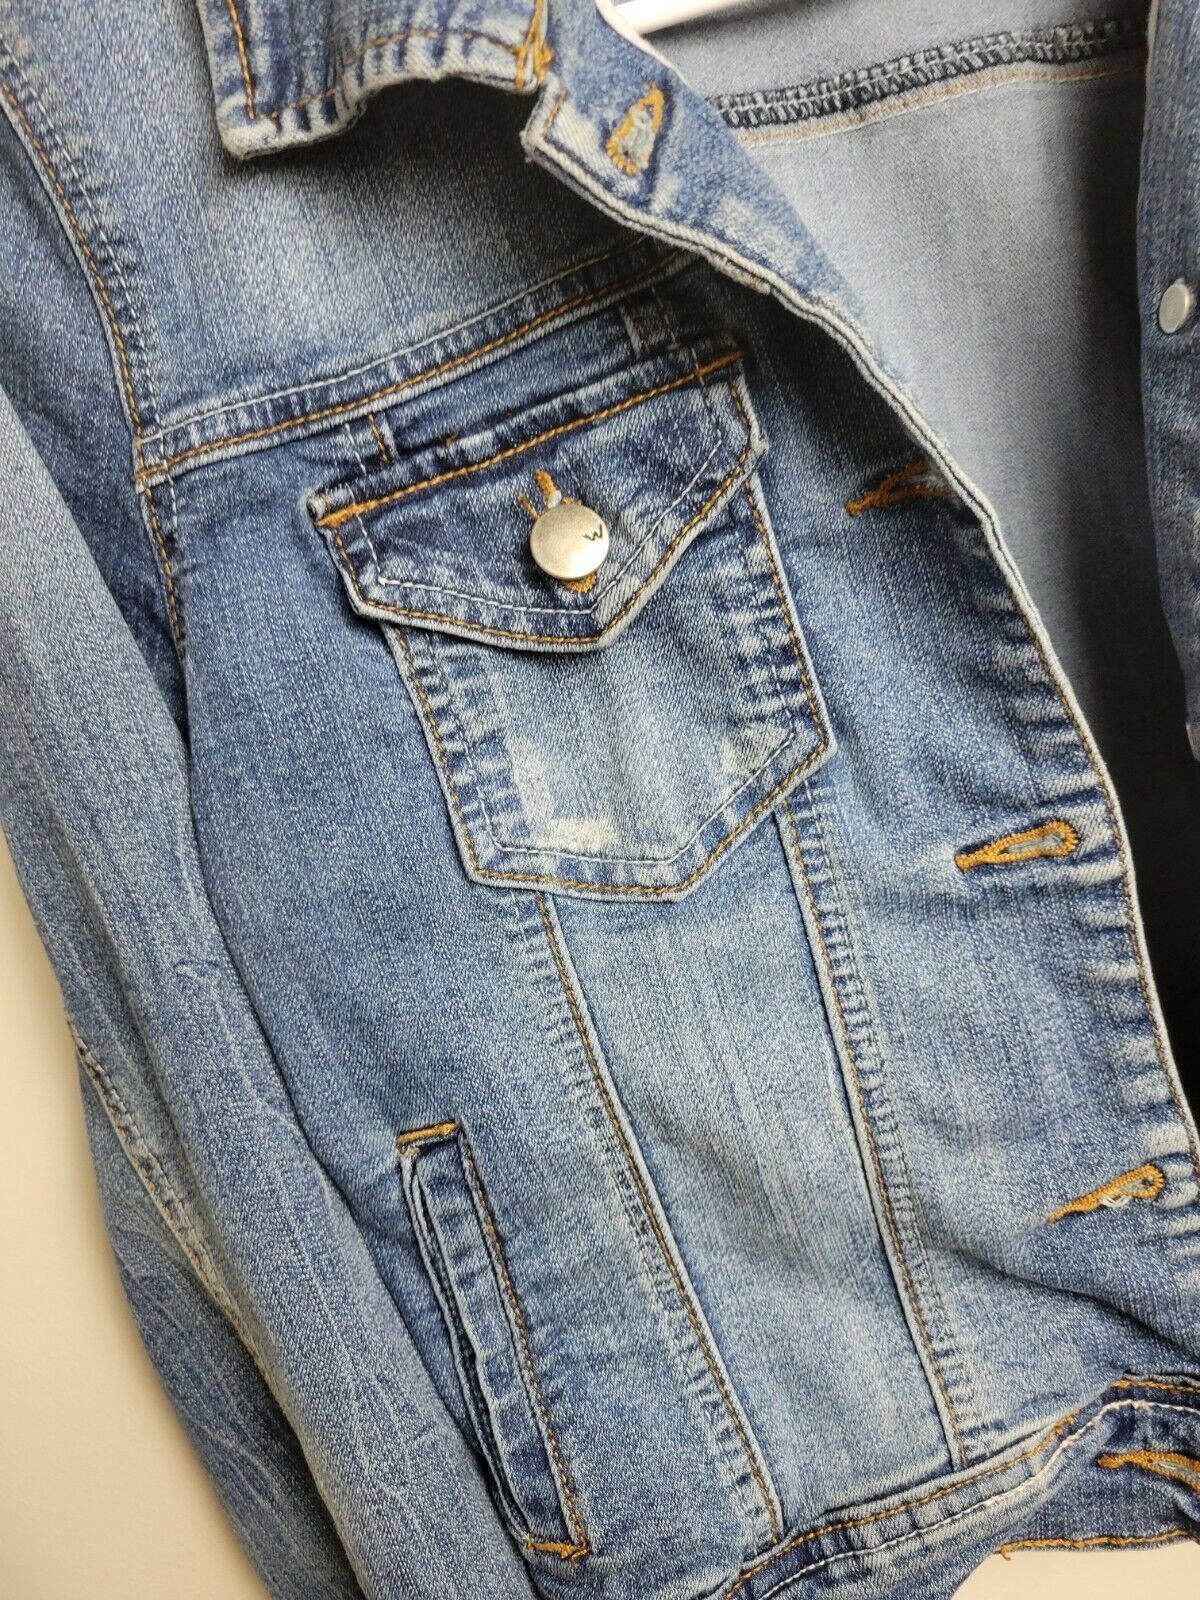 Womens Jean Jacket Small Wax Jeans - image 5